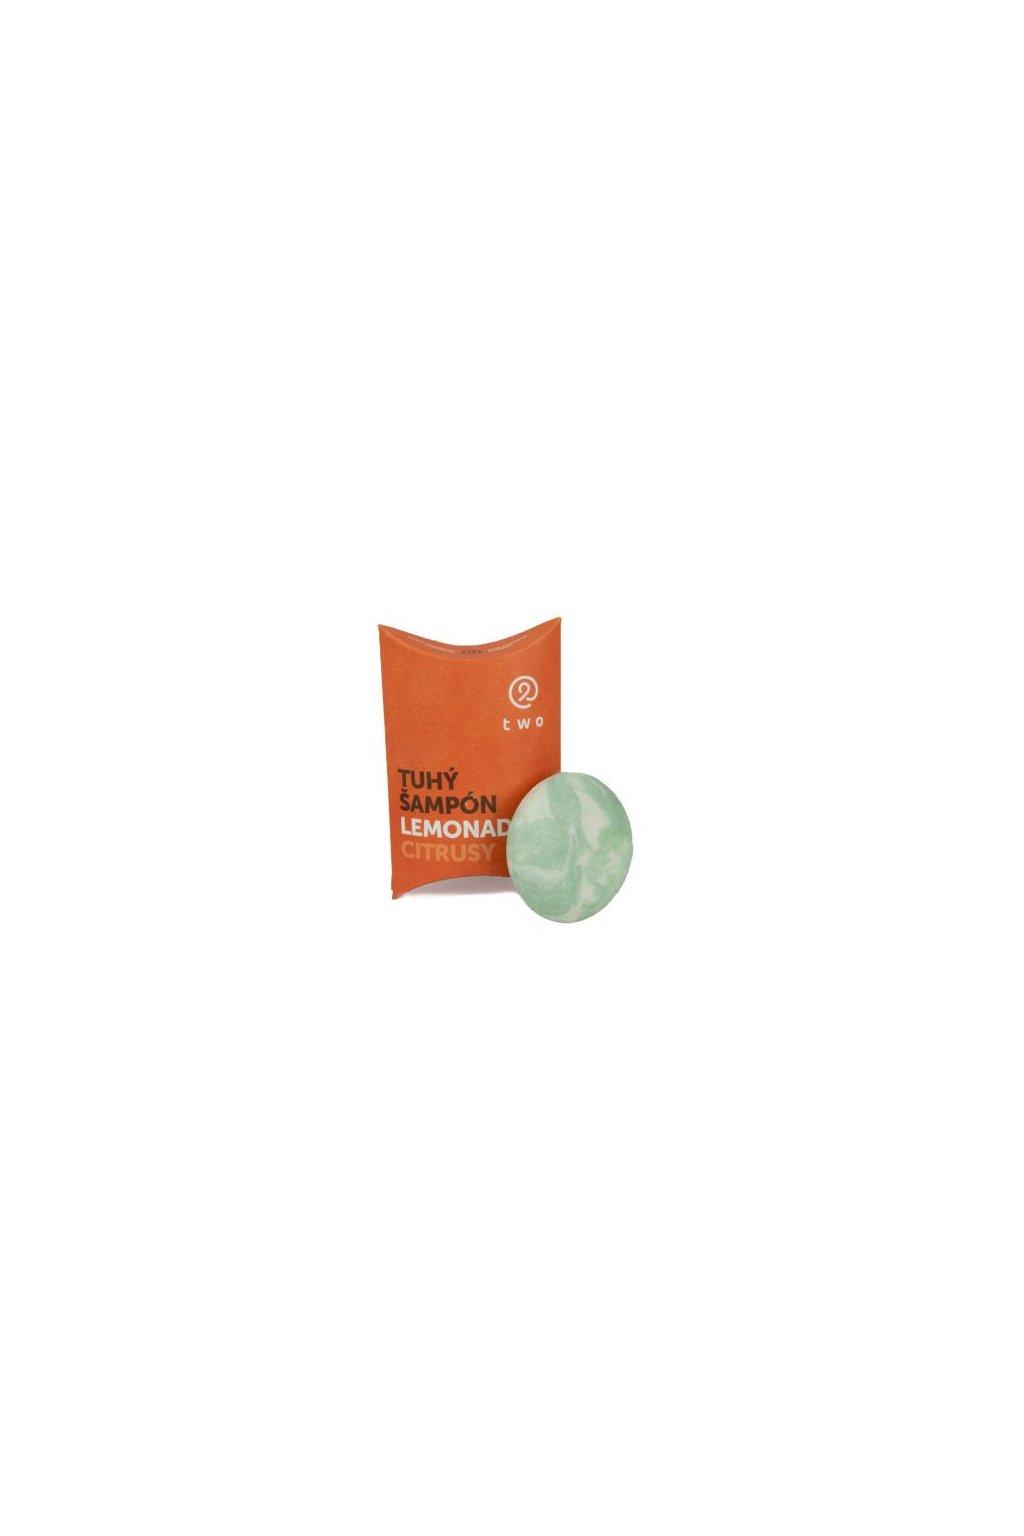 8999 two cosmetics tuhy sampon pro lesk a vitalitu lemonade citrusy 85 g